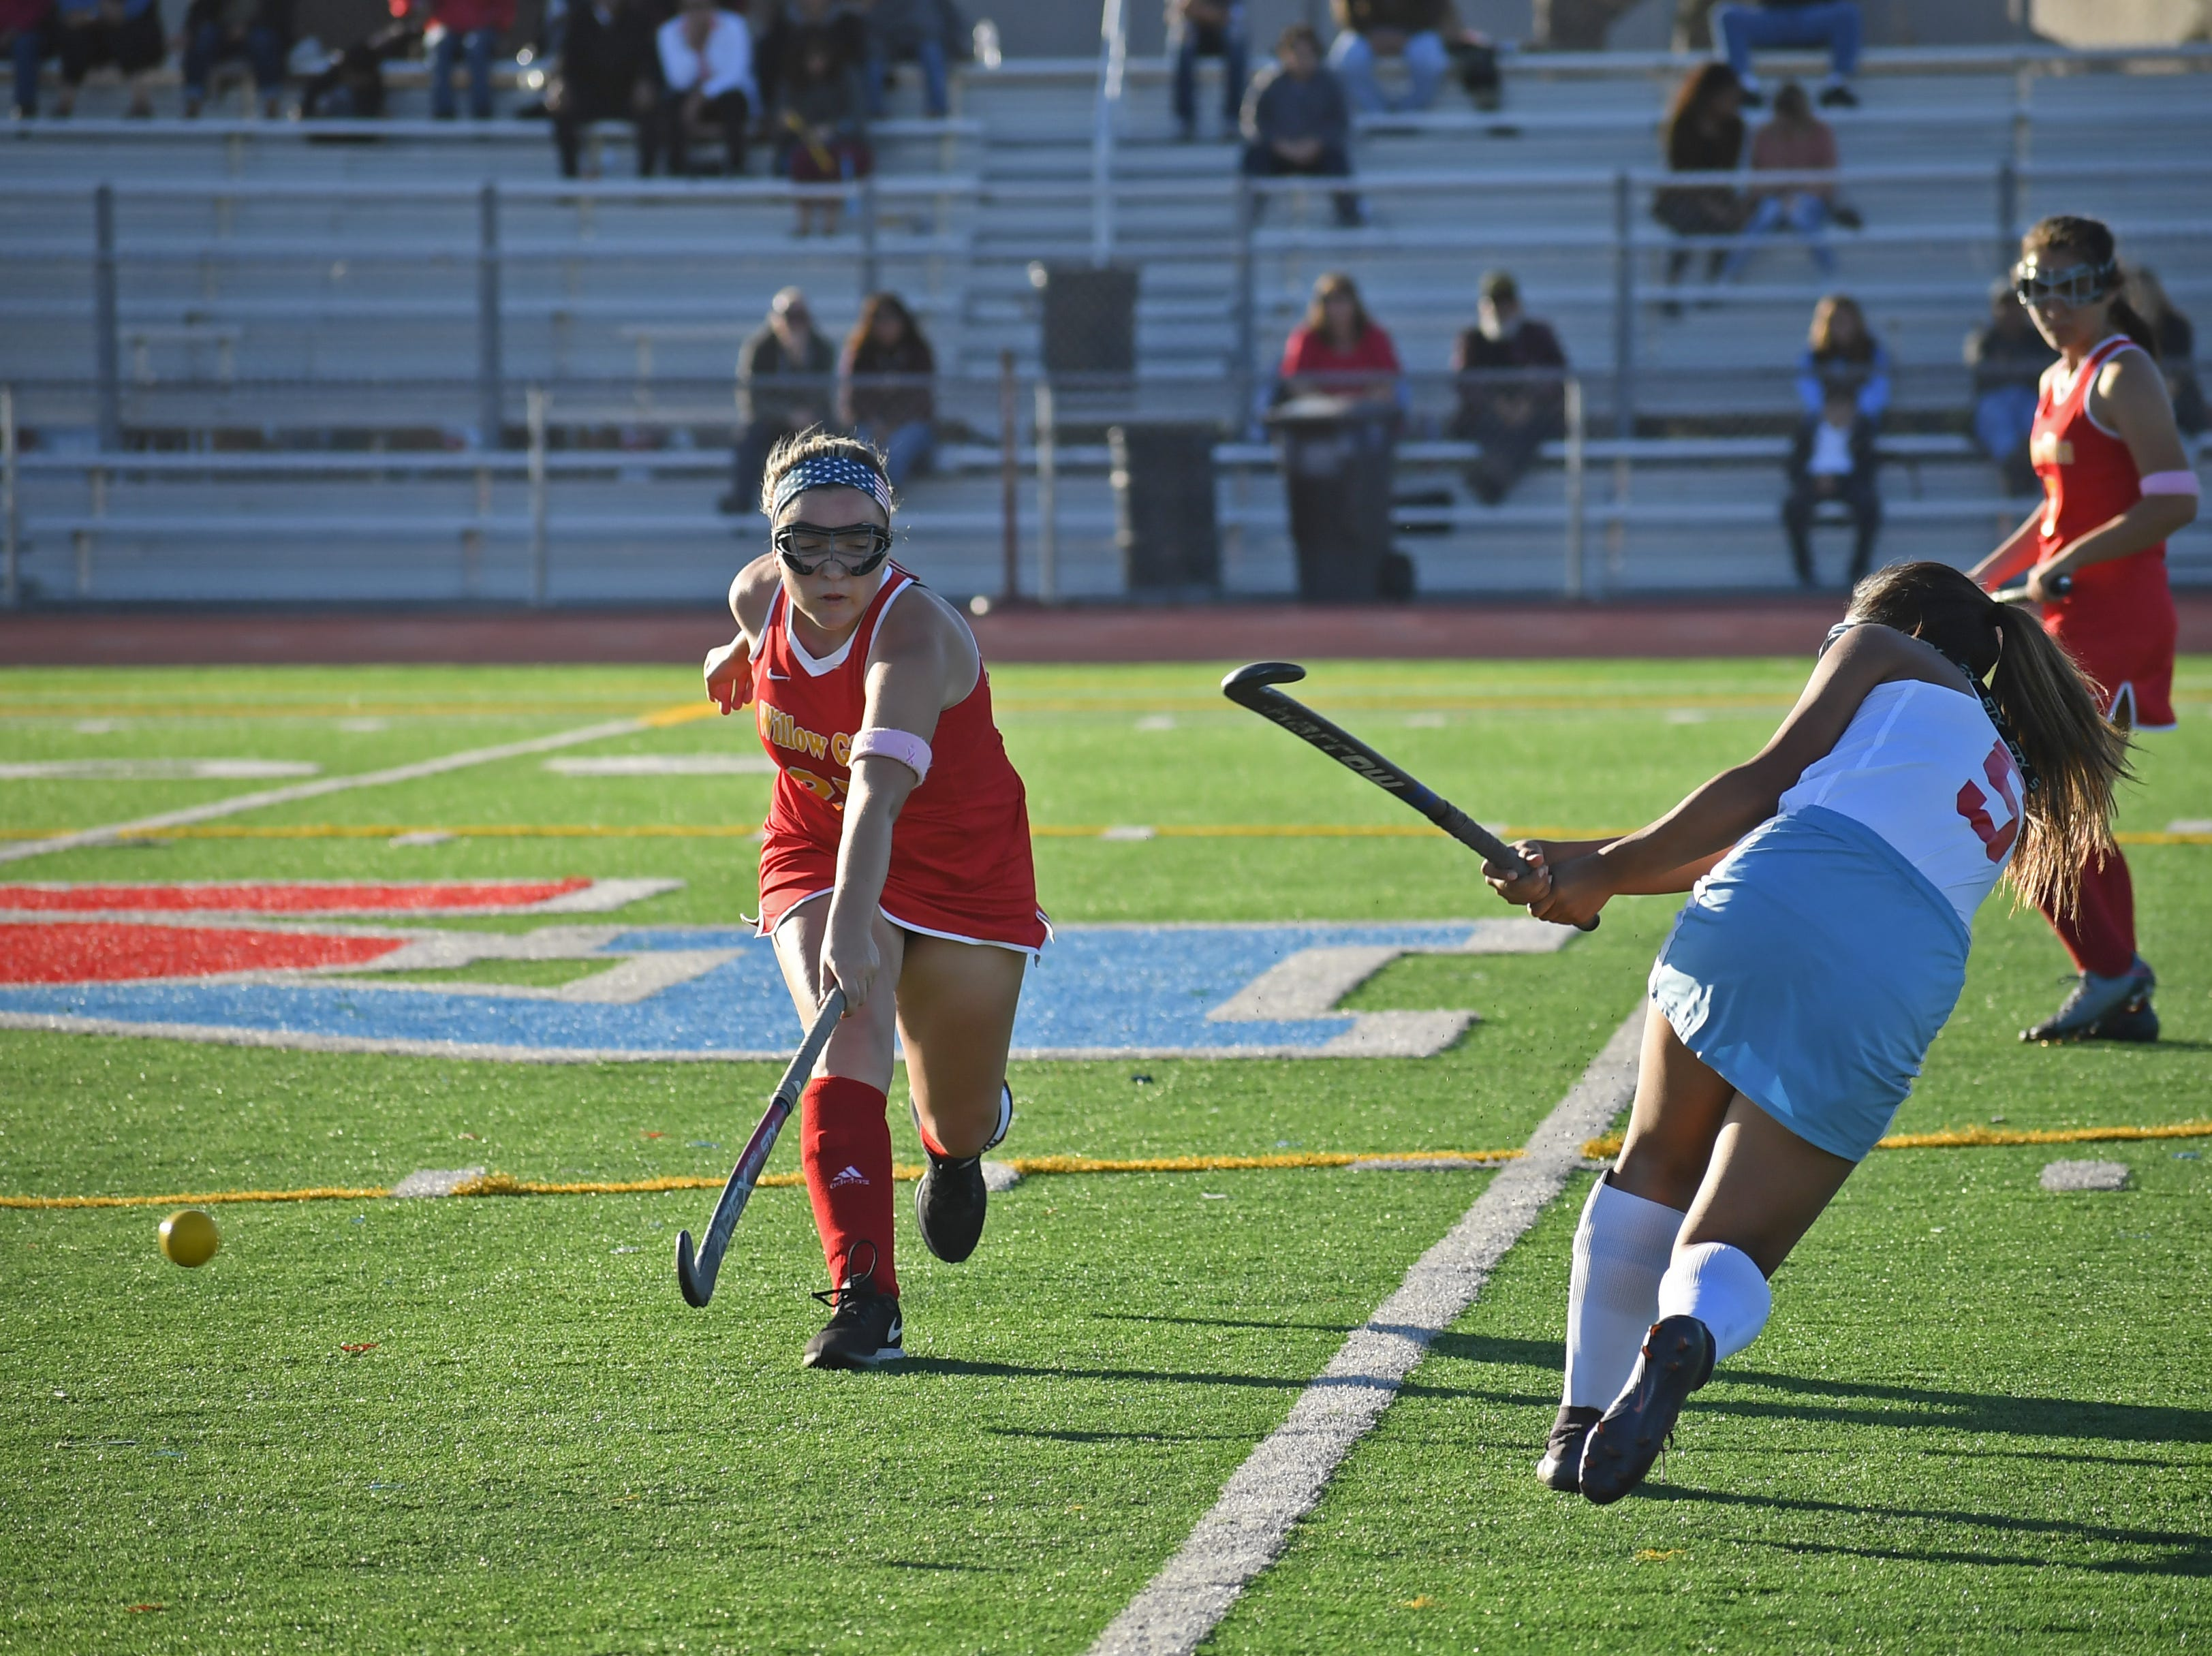 Midfielder Samantha Herrera (5) fires a pass past one of the Willow Glen midfielders.